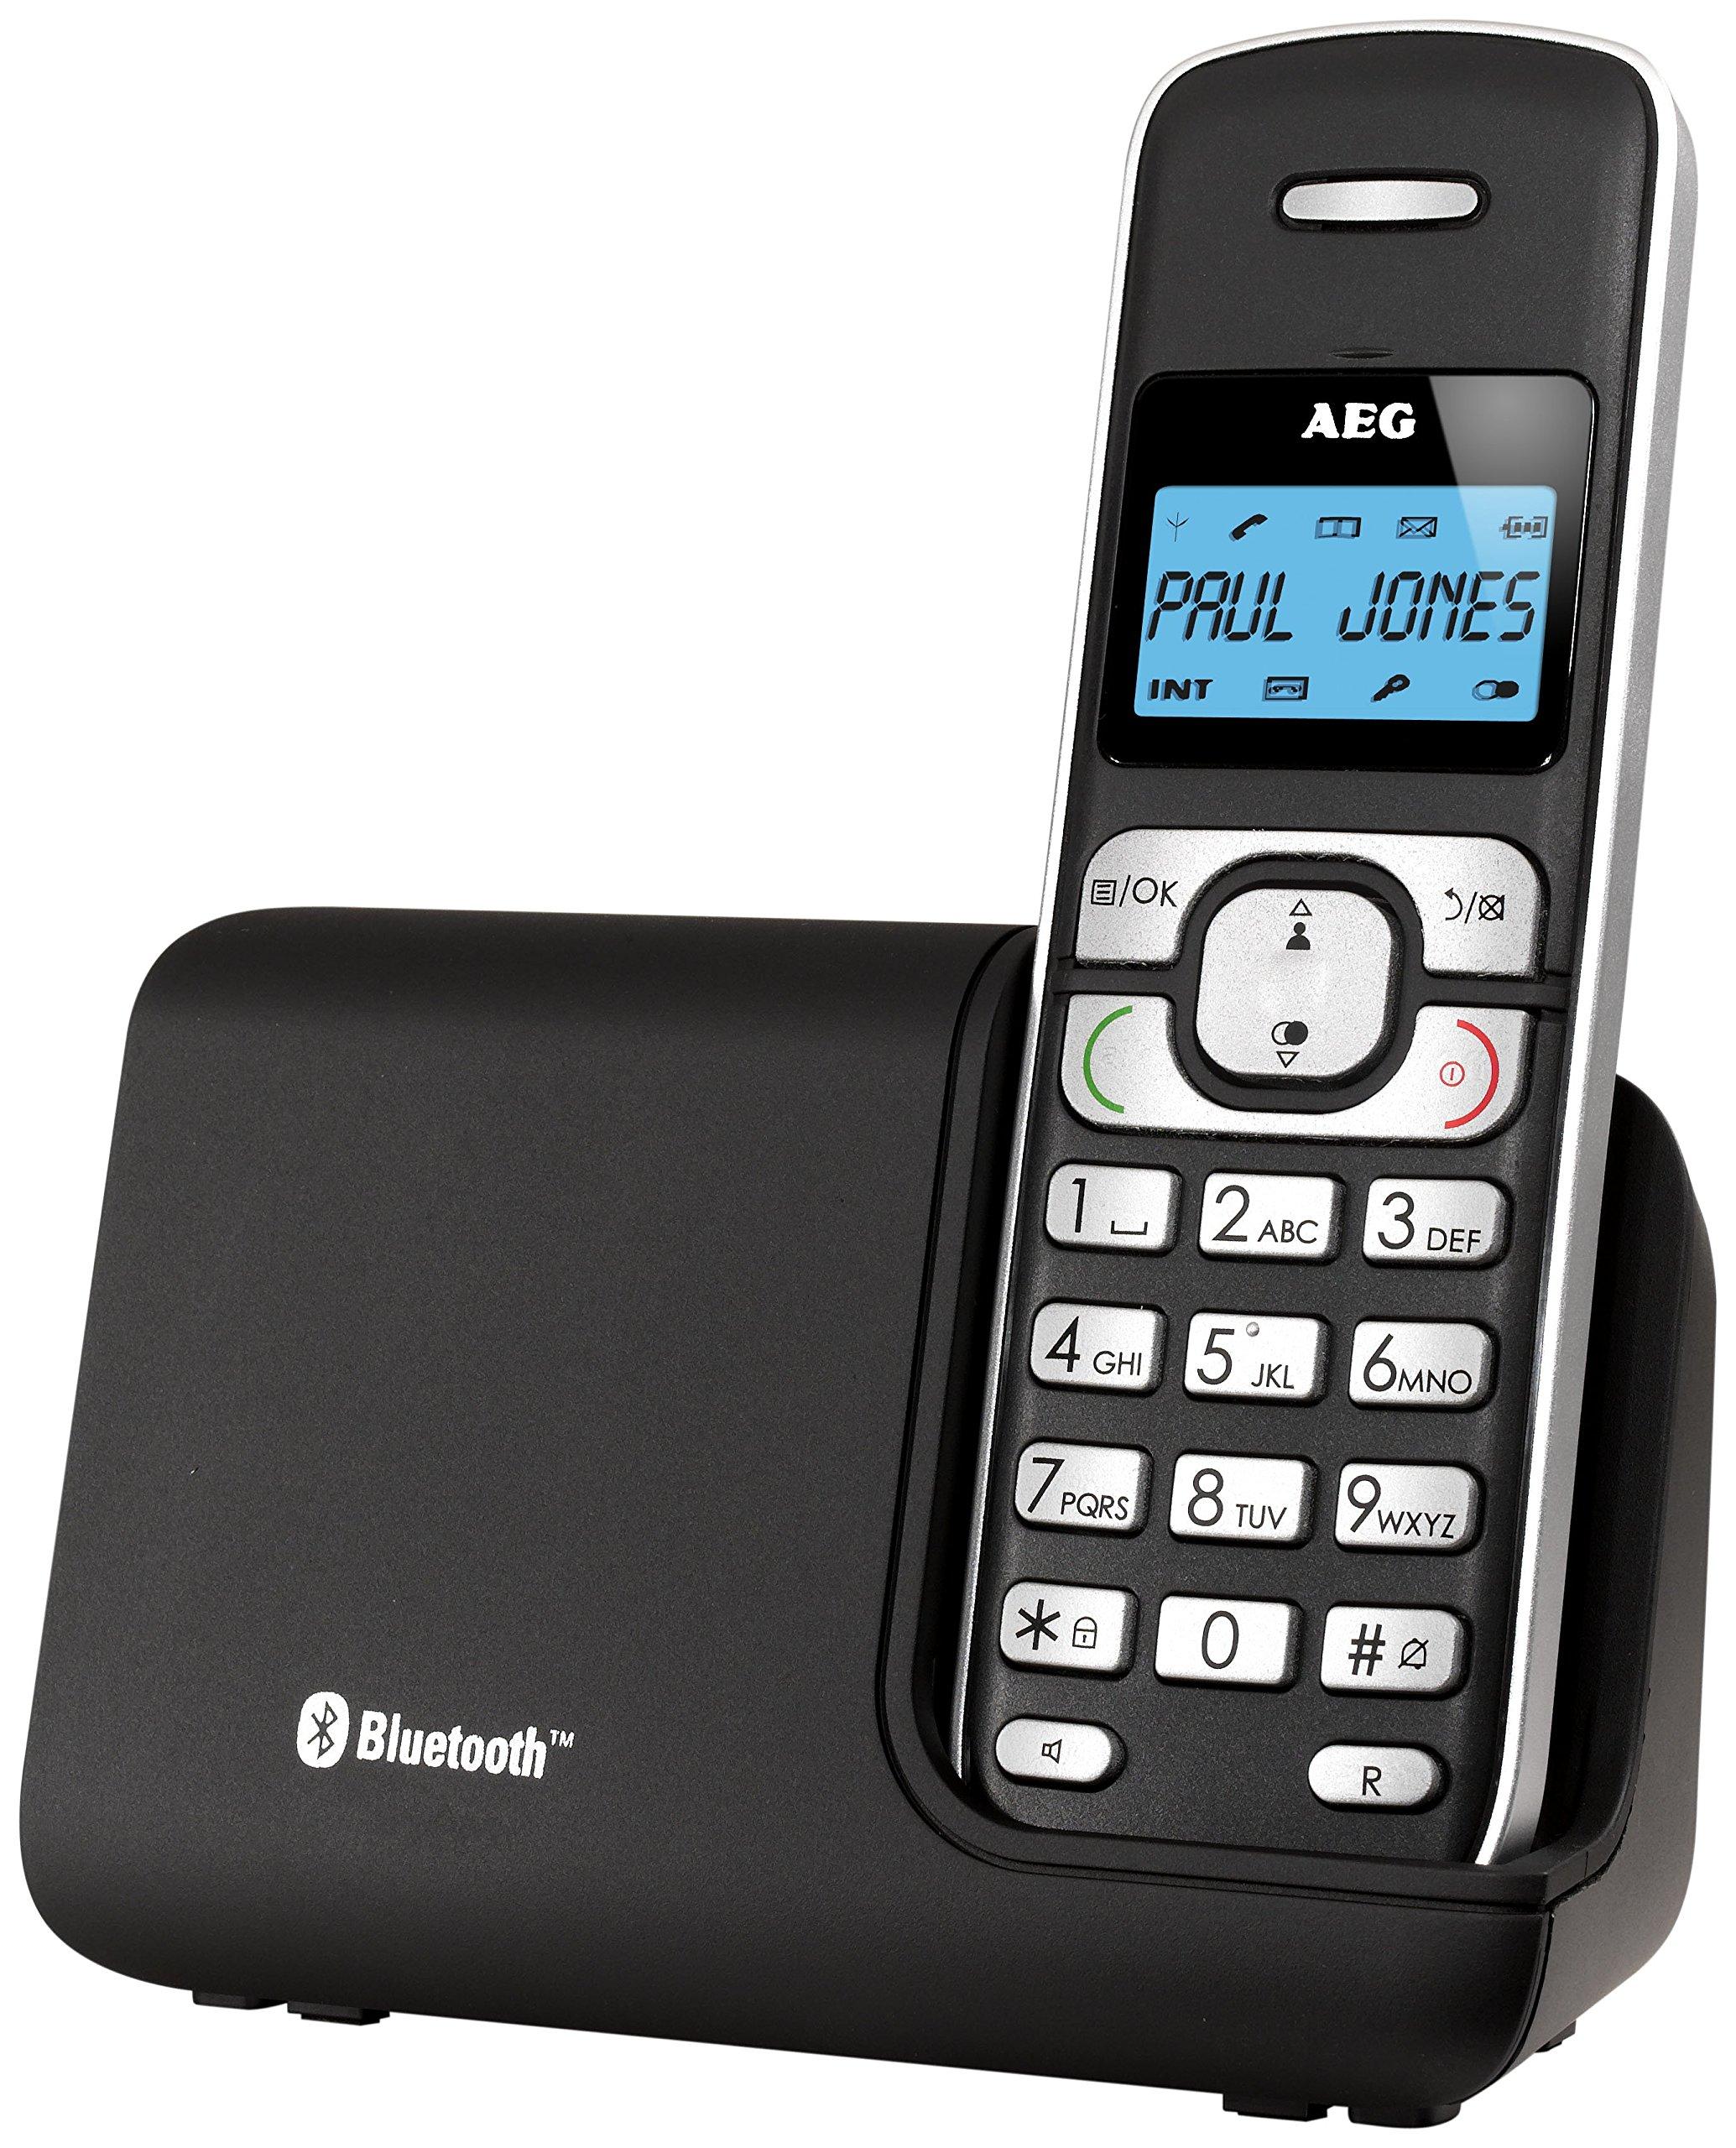 AEG Voxtel D220BT - Teléfono inalámbrico DECT (Gap, Bluetooth, Agenda para 50 contactos) Color Negro: AEG: Amazon.es: Electrónica